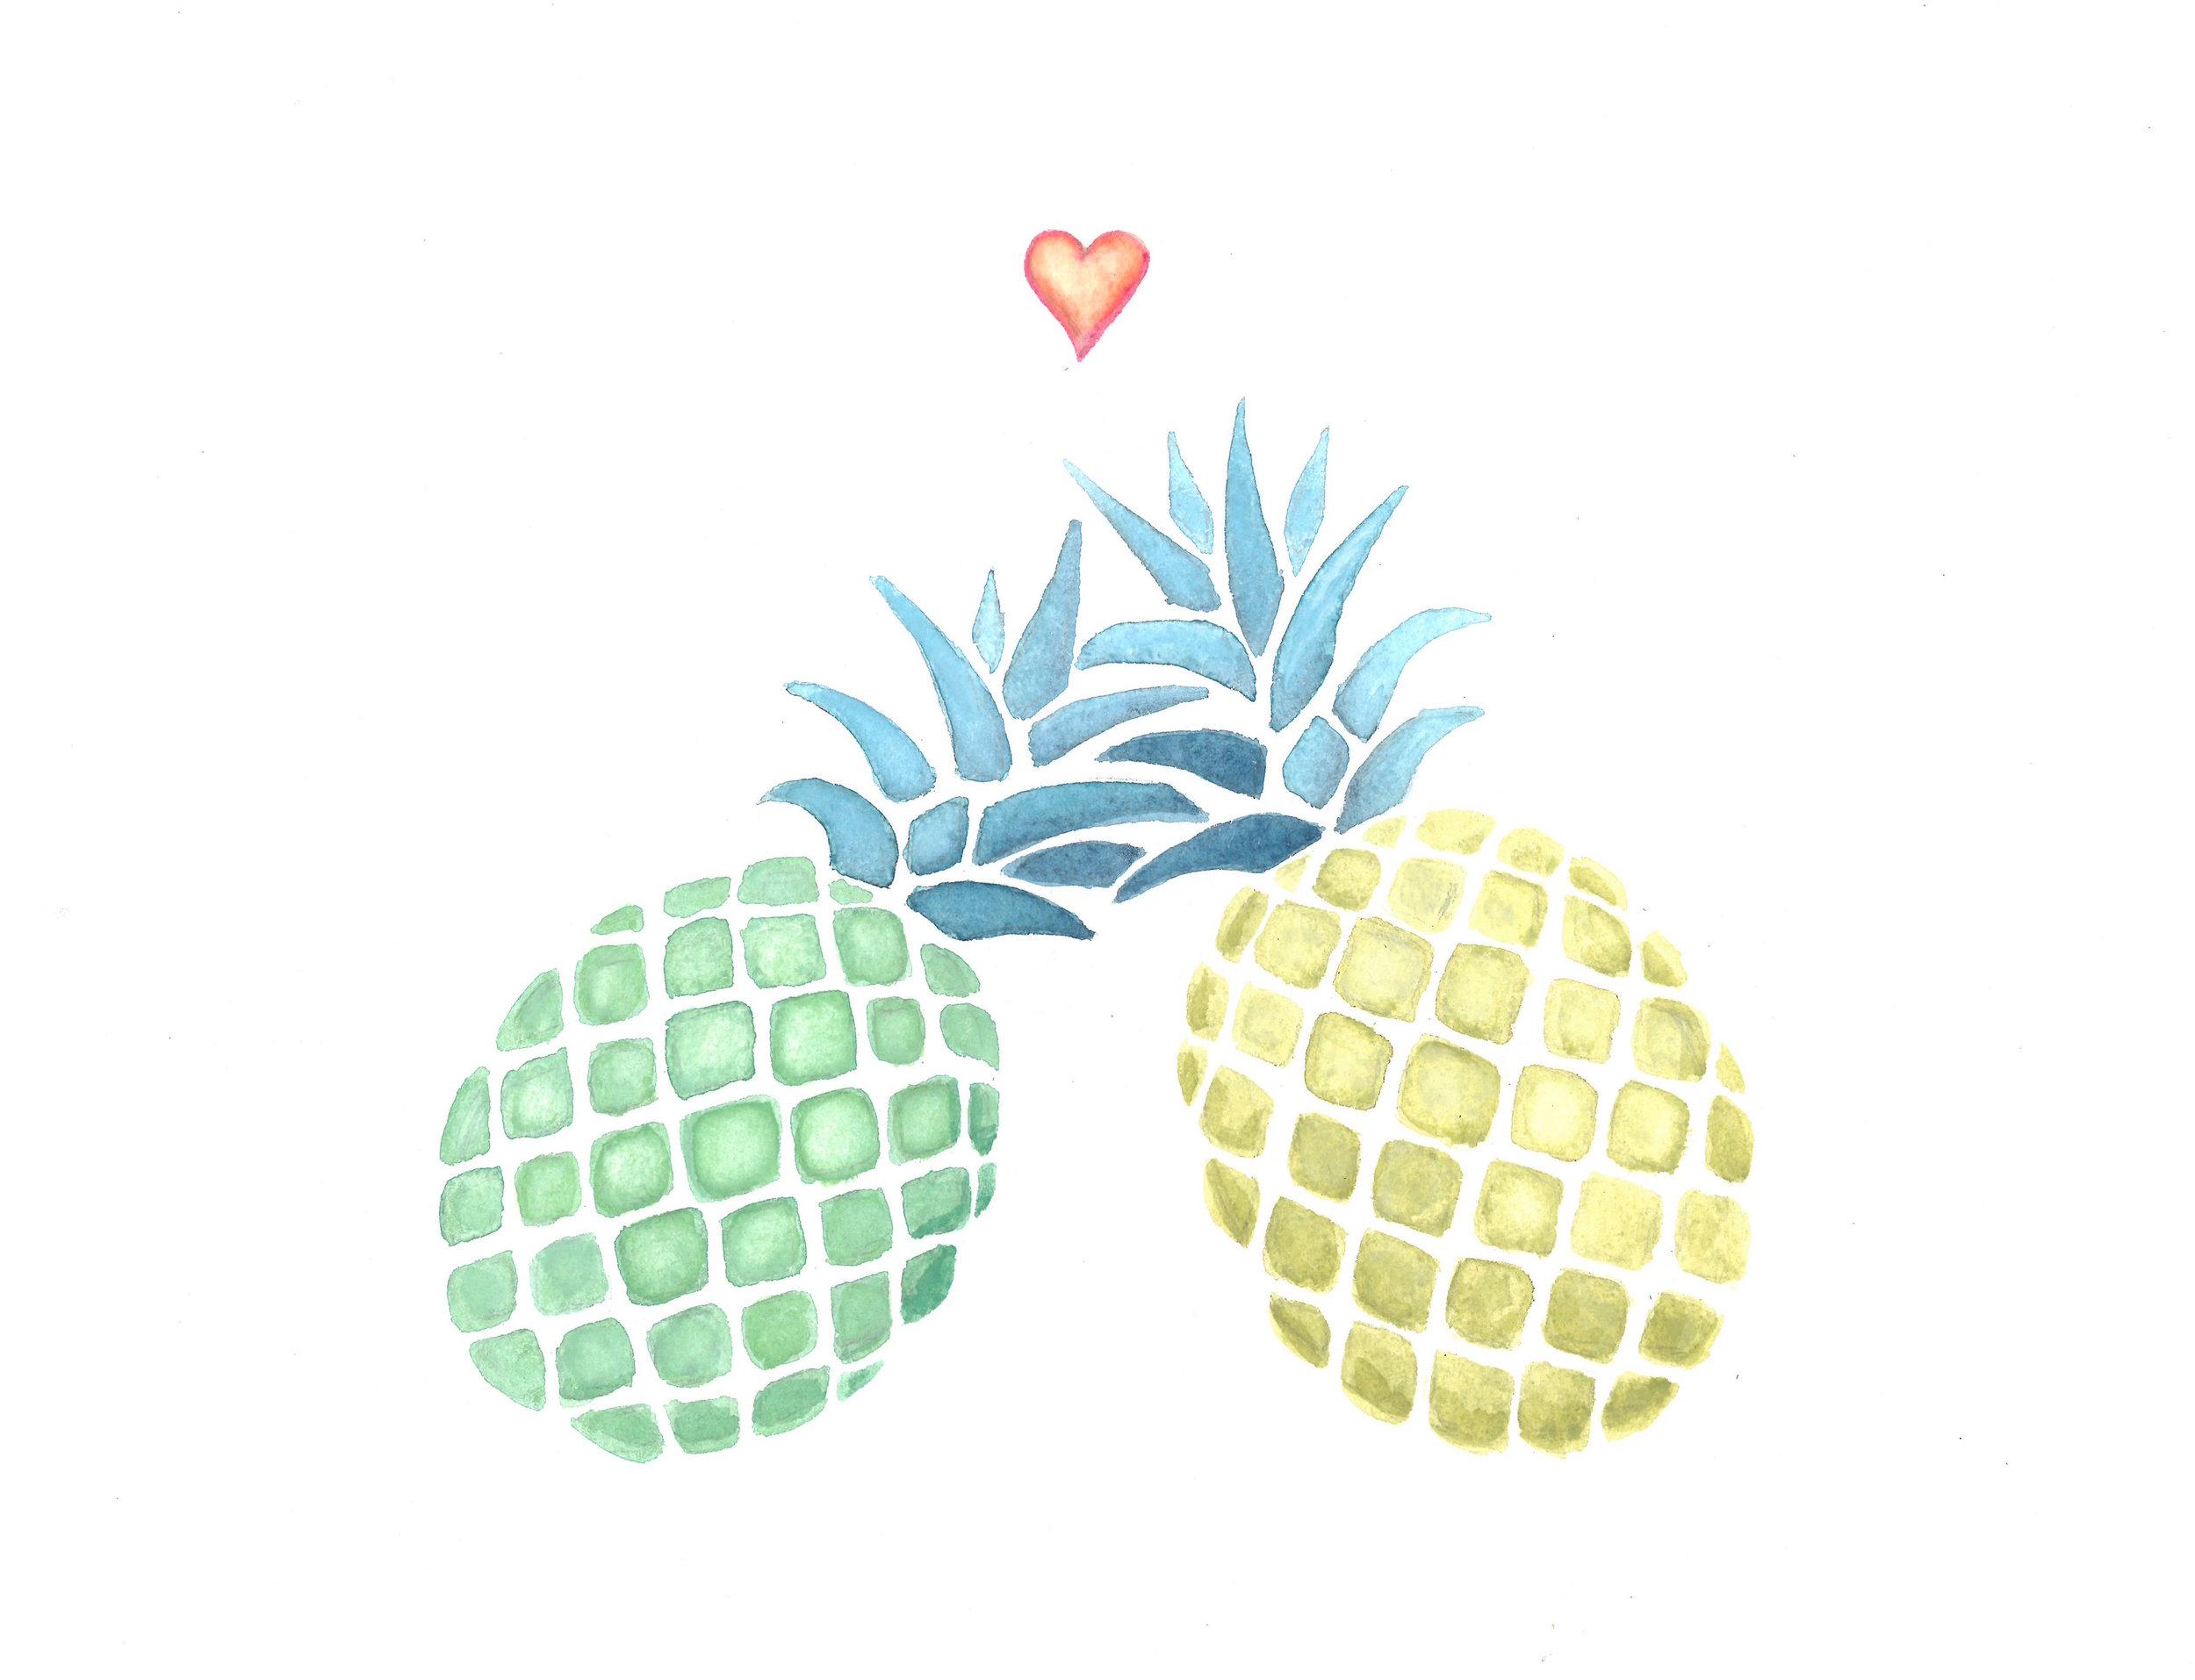 Pineapple_0001.jpg